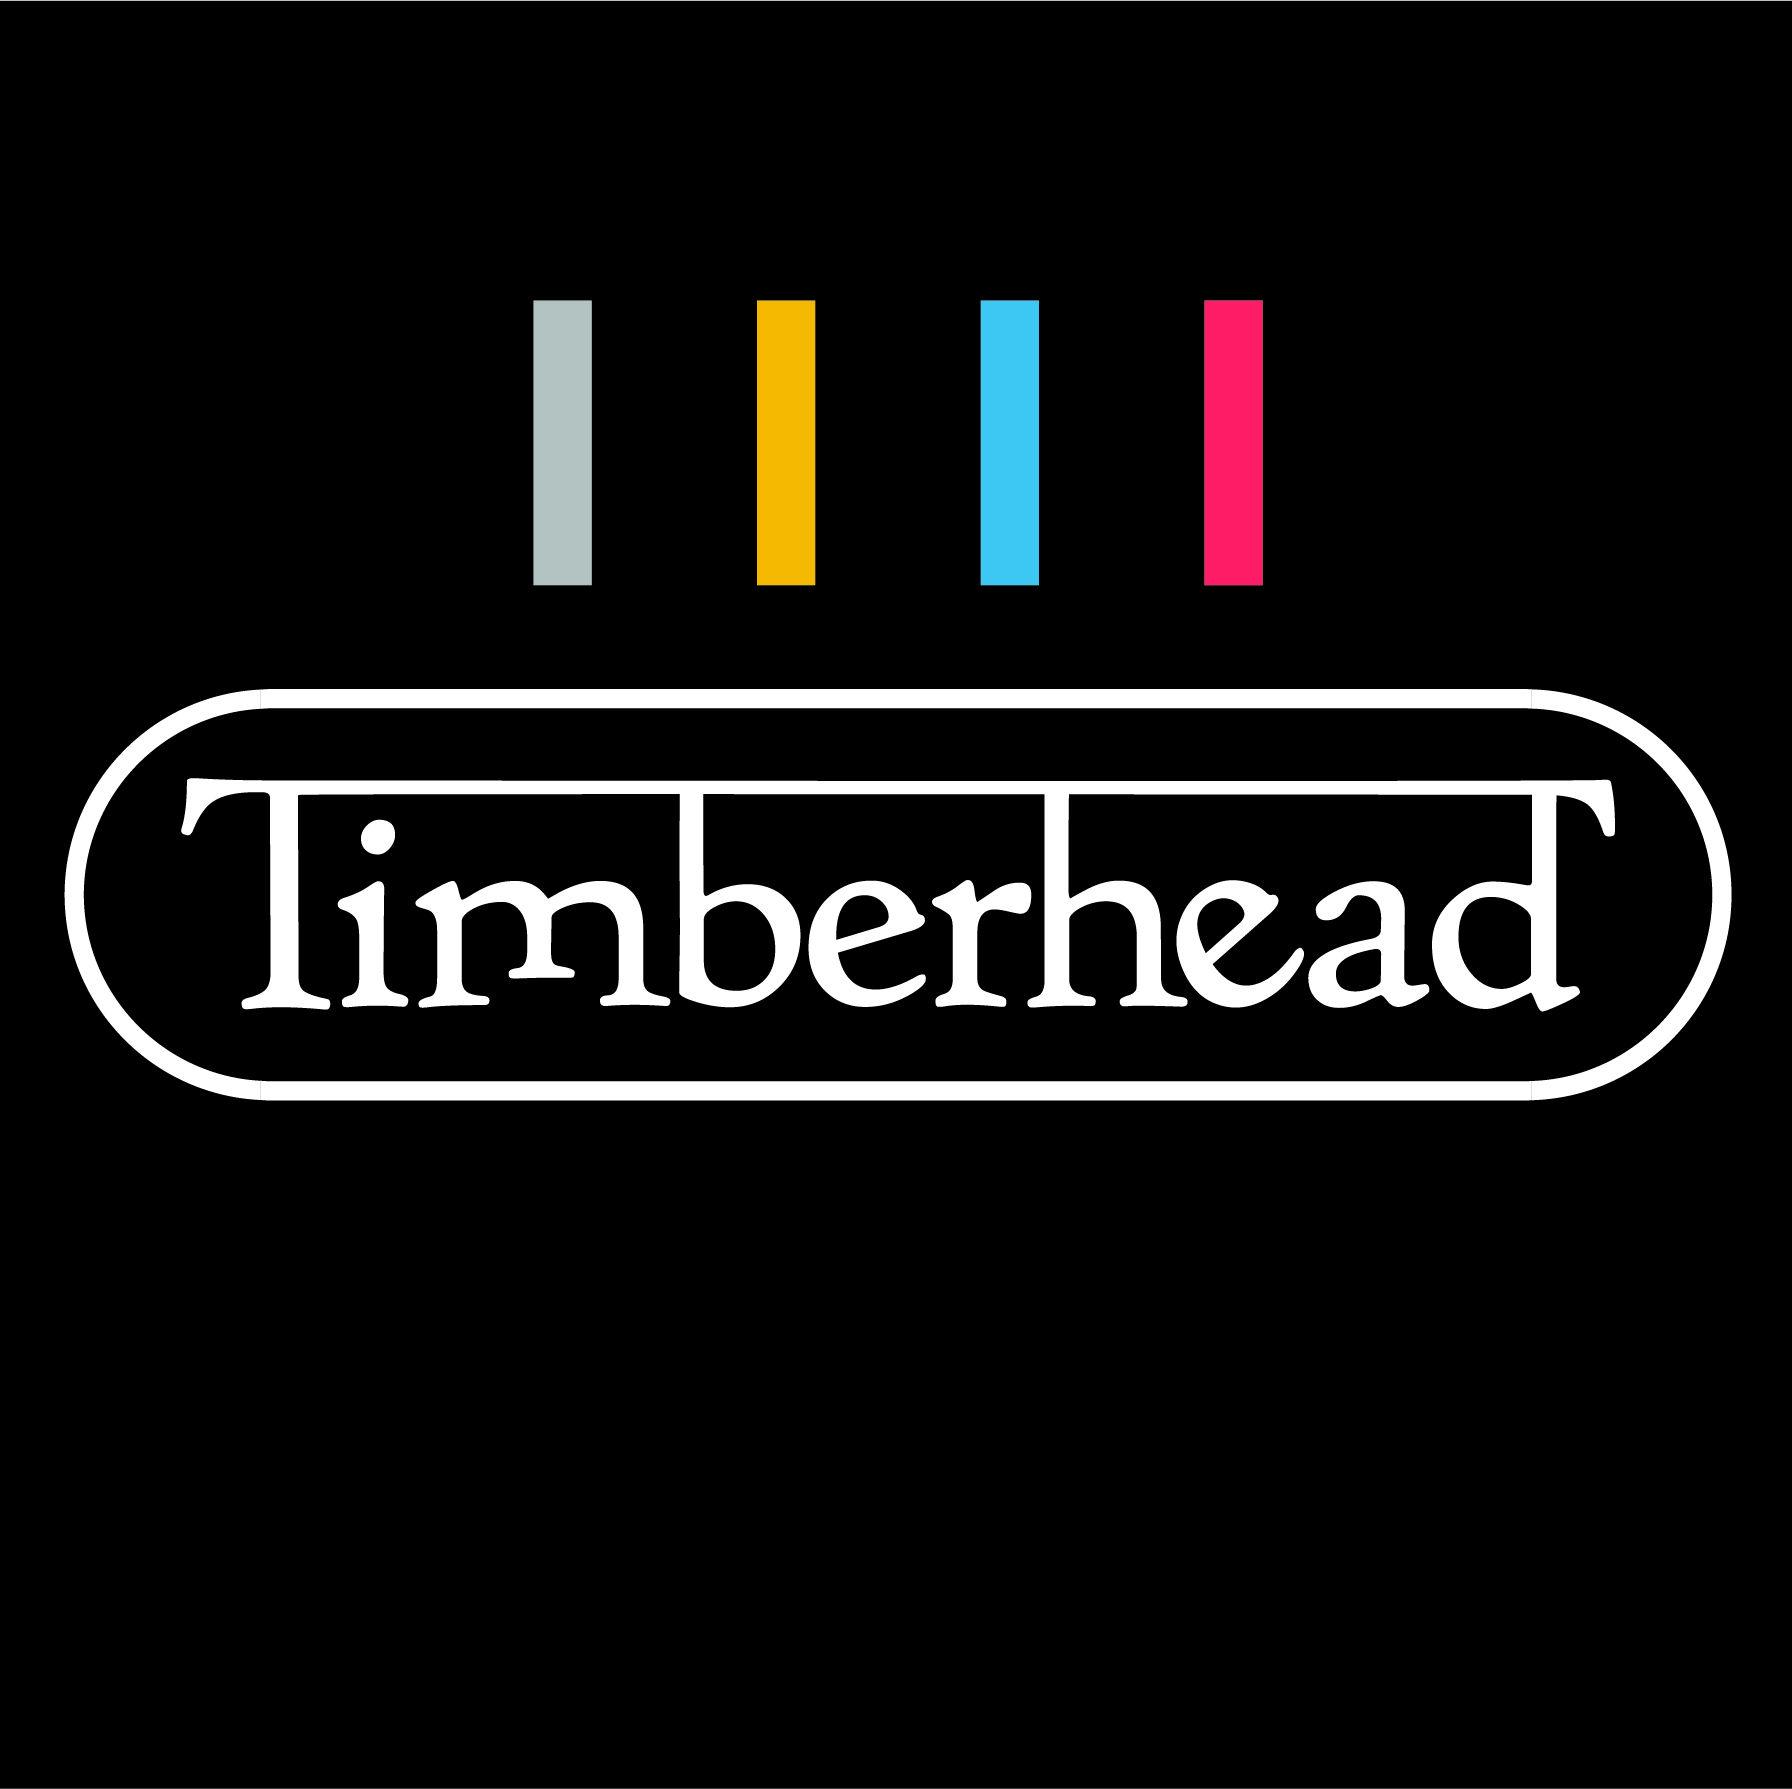 Timberhead Wordmark white border.jpg